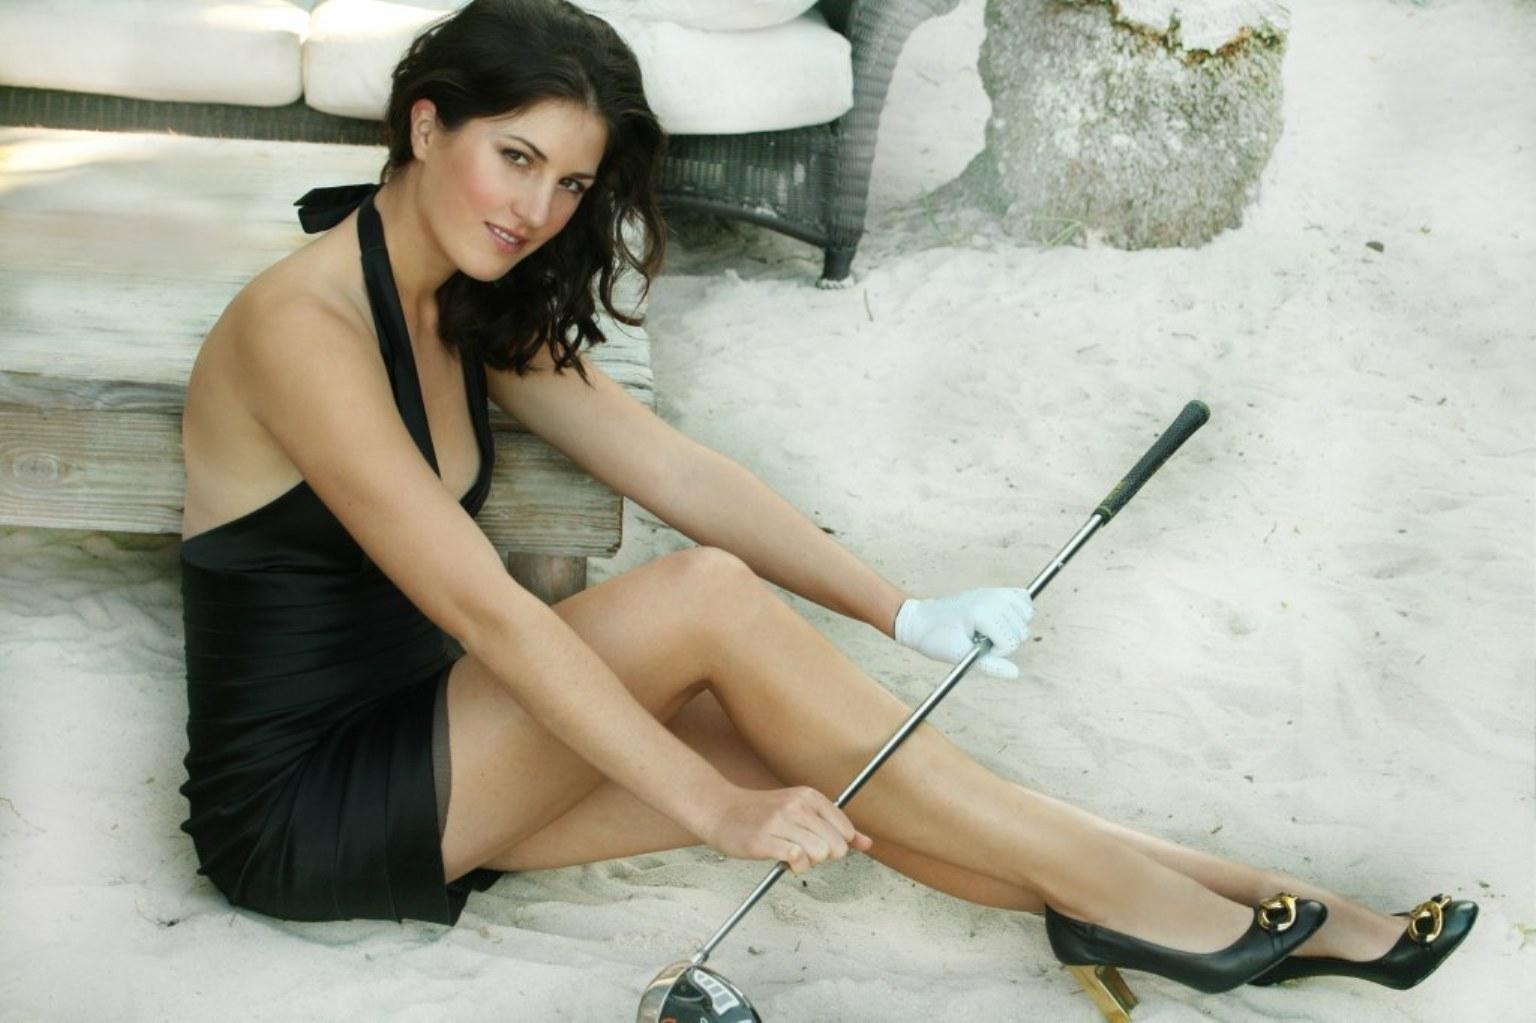 http://4.bp.blogspot.com/-OOk46Cct6WI/T5ALryUMmkI/AAAAAAAAG9A/bahkLspDXIU/s1600/Sandra+Gal+a+2012_2.jpg